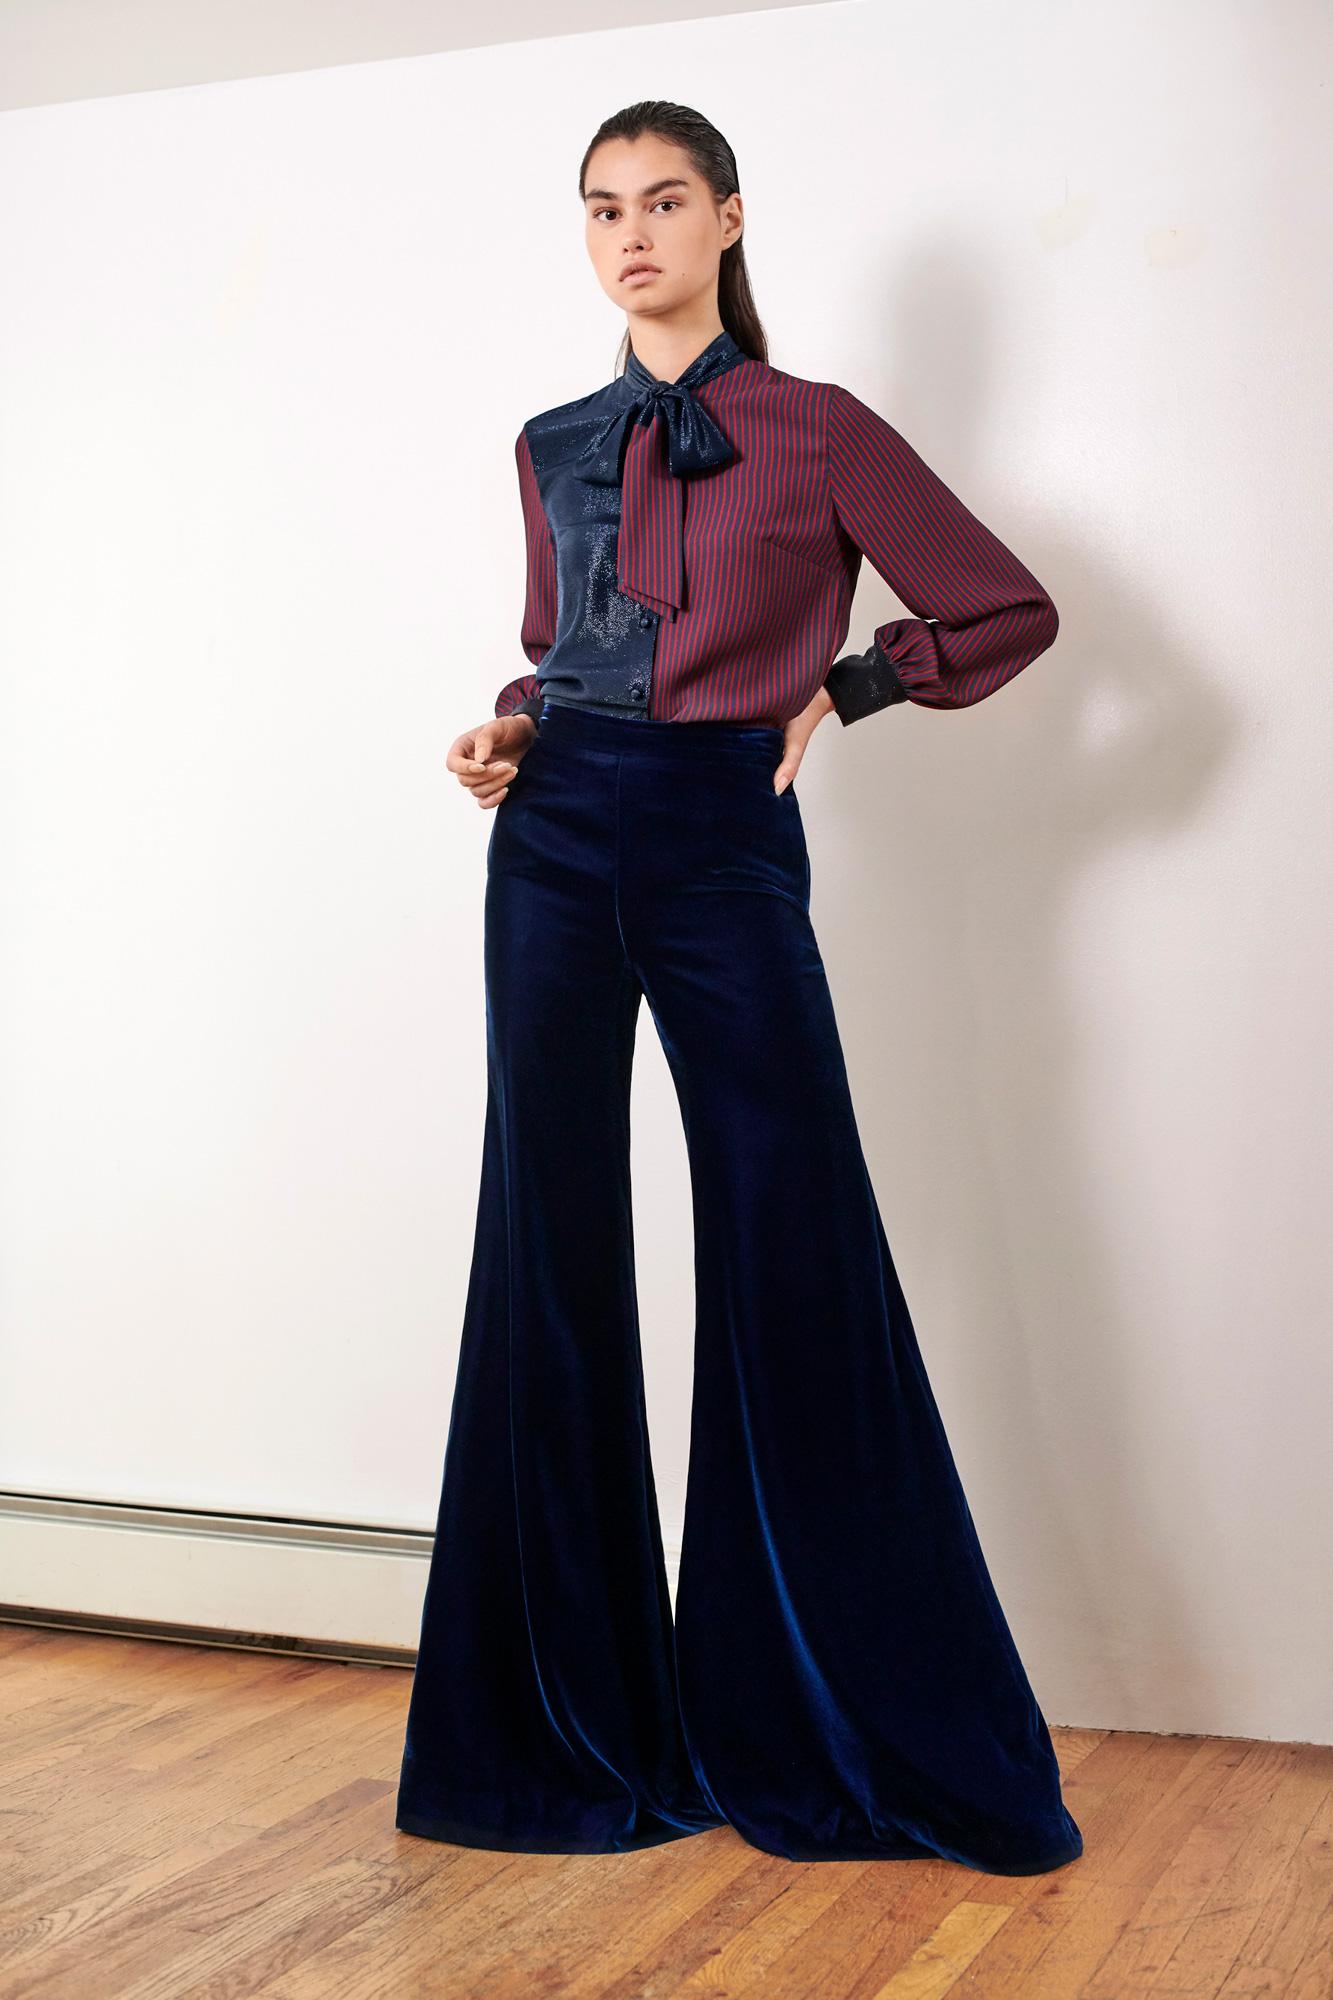 JULIANNA-BASS-PF19-09-The-Jera-Blouse-&-The-Patty-Trouser-WEB.jpg